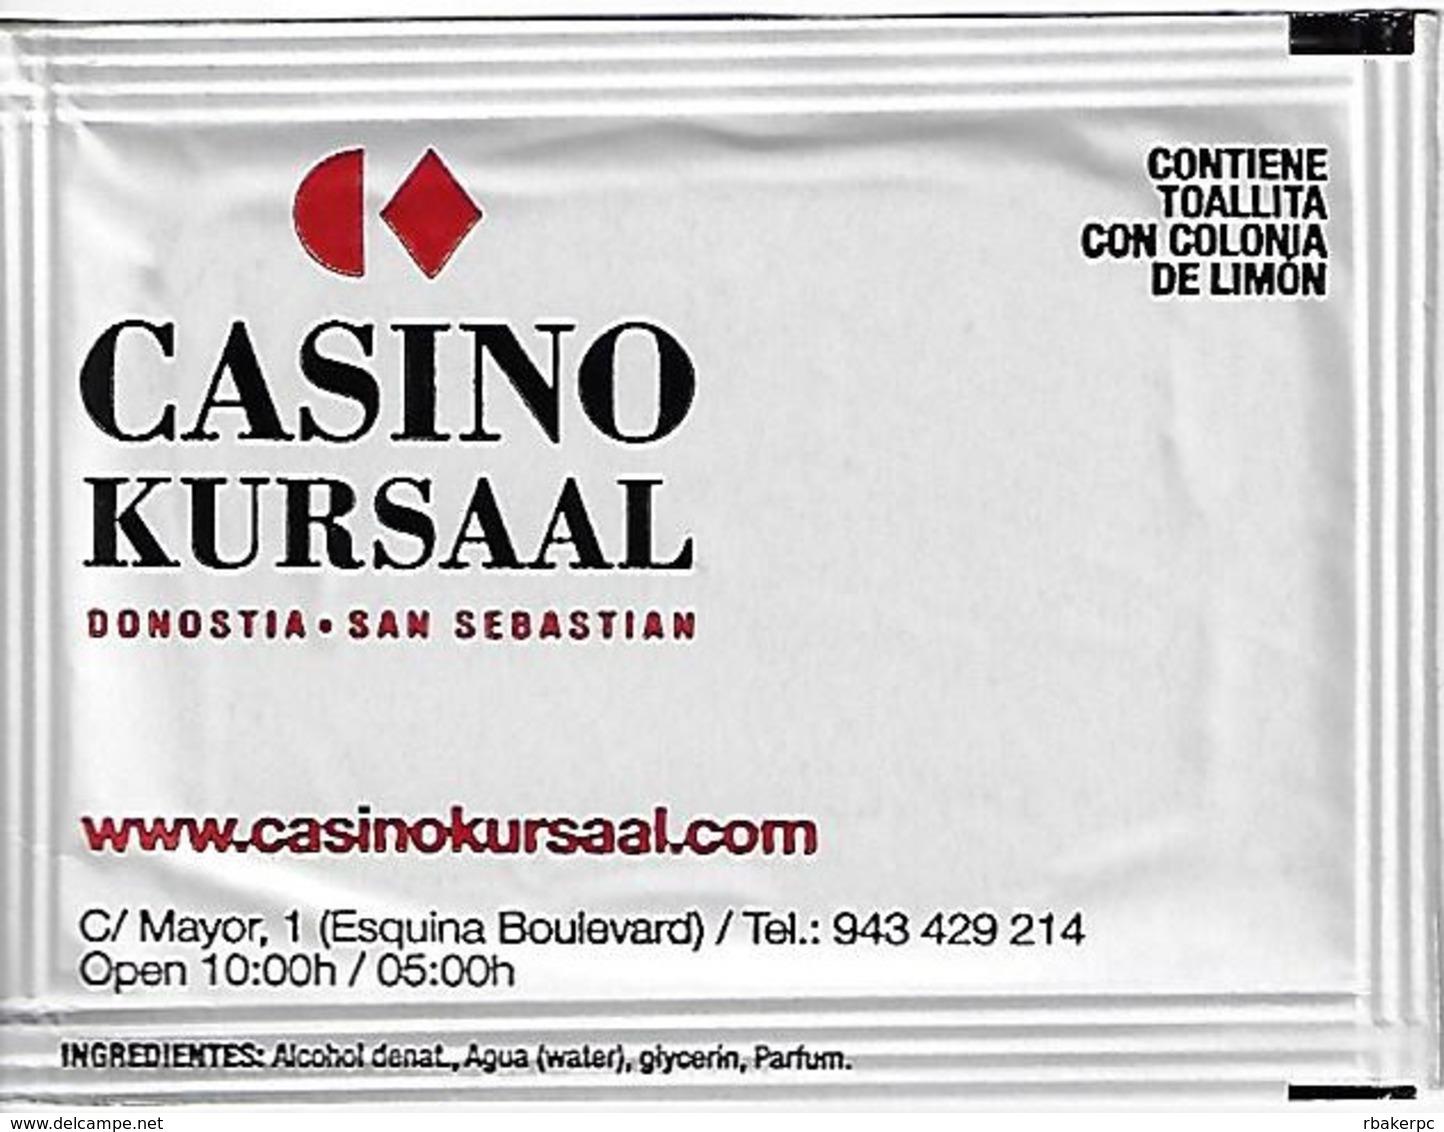 Casino Kursaal San Sebastian Spain - Hand Wipe Packet - Casino Cards